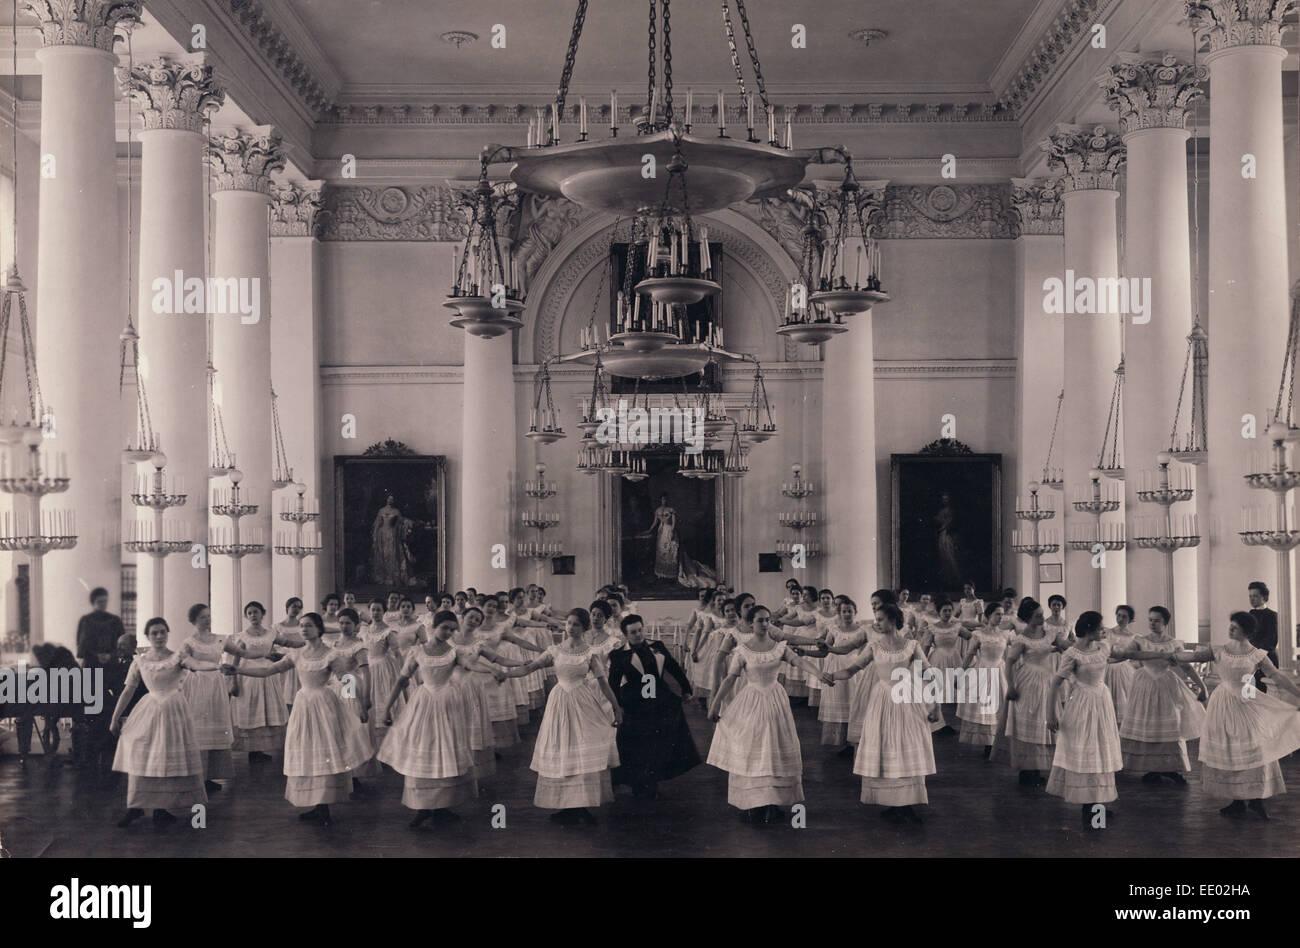 Dancing Lesson, the 'Mazurka'.; Karl Karlovitz Bulla, Russian, 1854 - 1929; before 1917; Gelatin silver - Stock Image